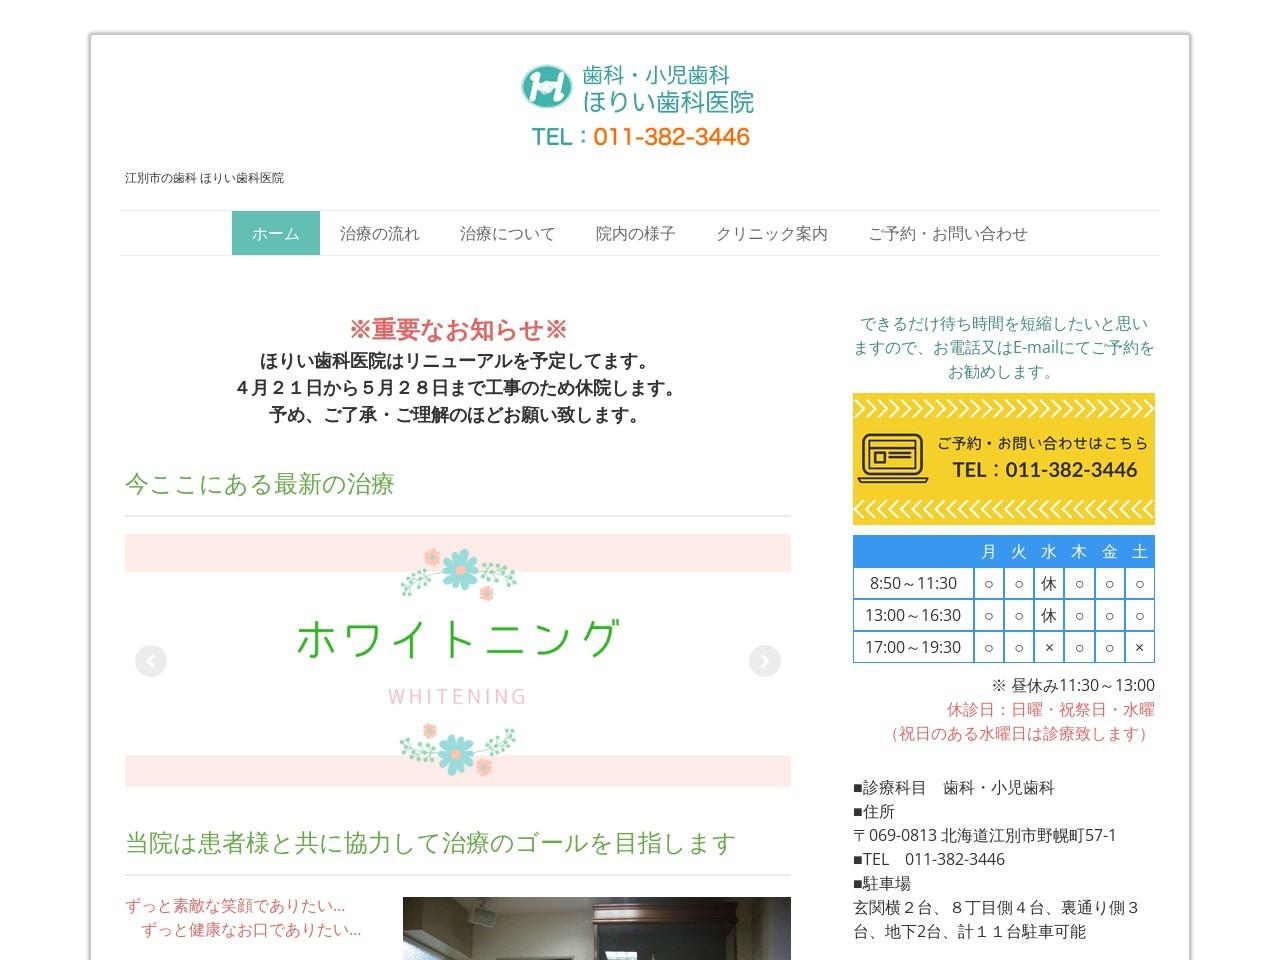 医療法人社団常仁会  ほりい歯科医院 (北海道江別市)